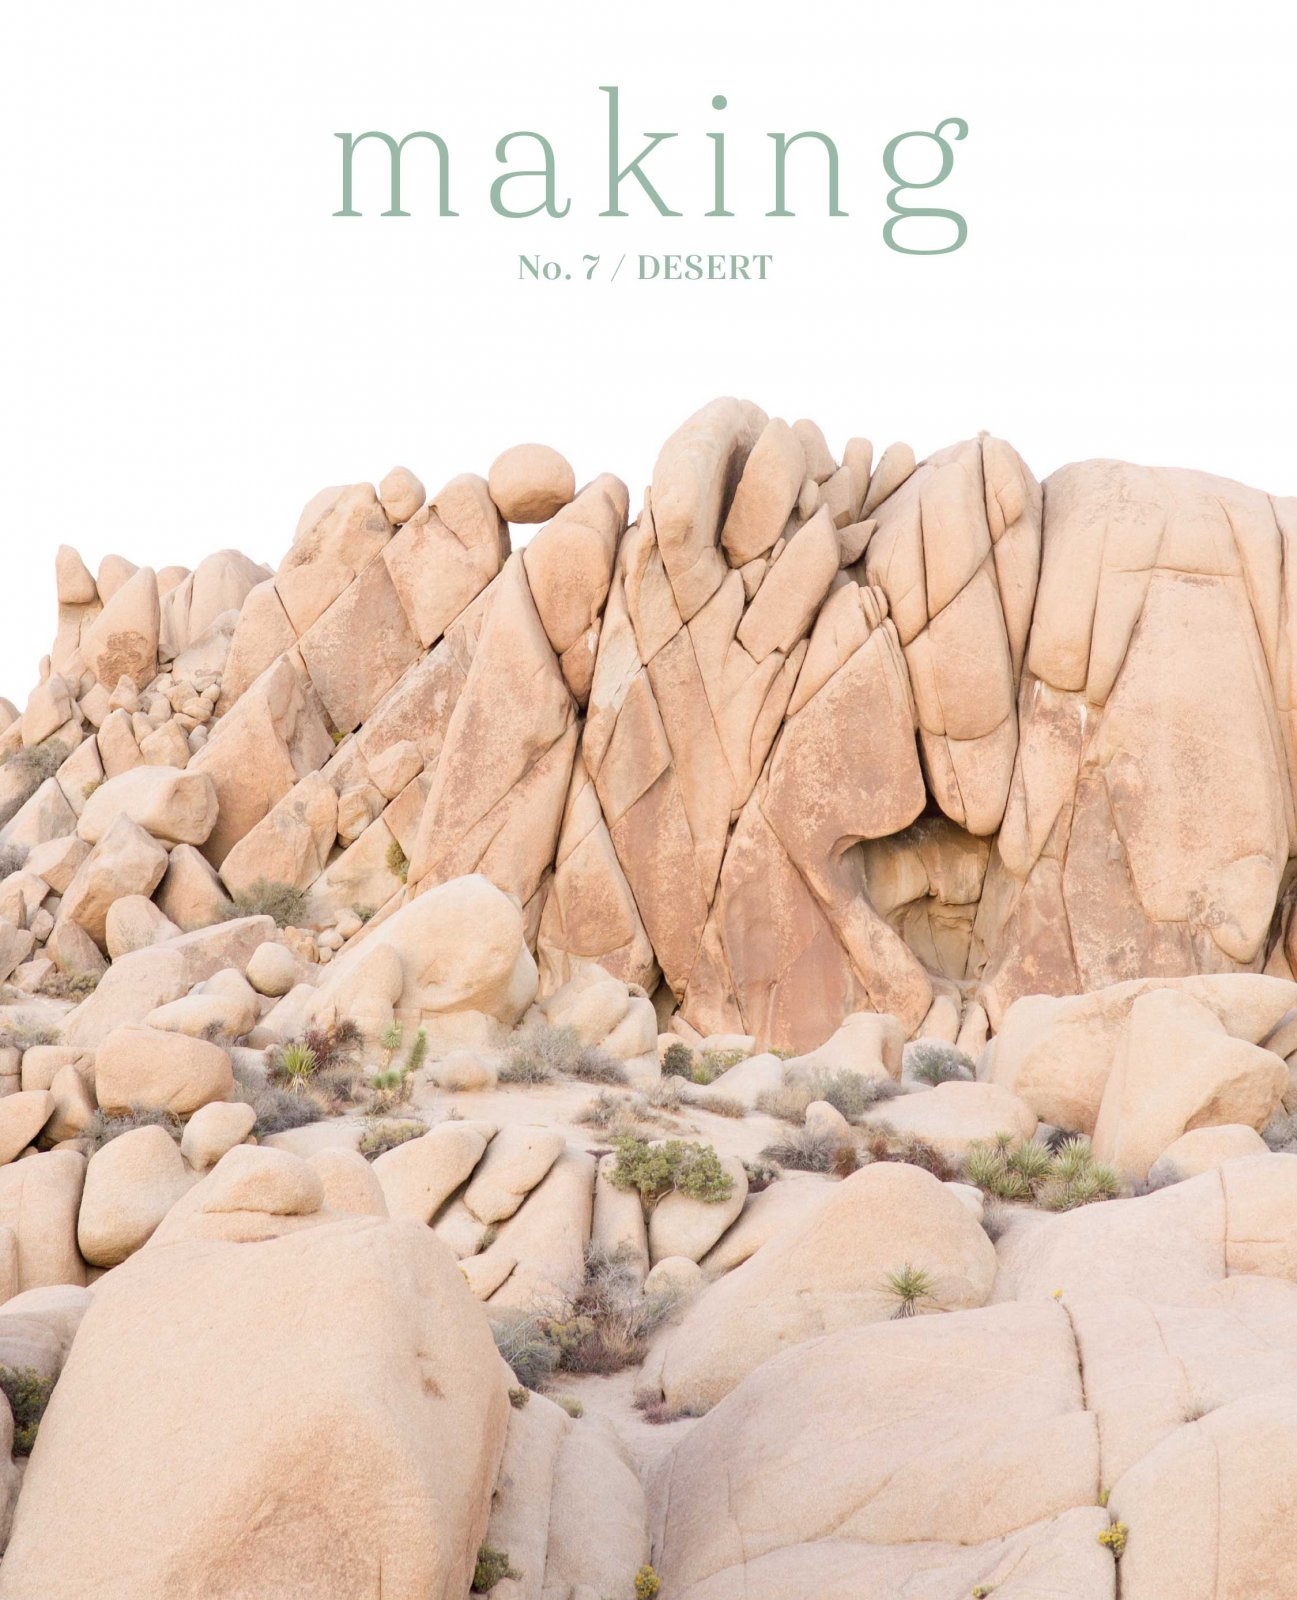 Making Magazine/Desert (Issue No. 7)